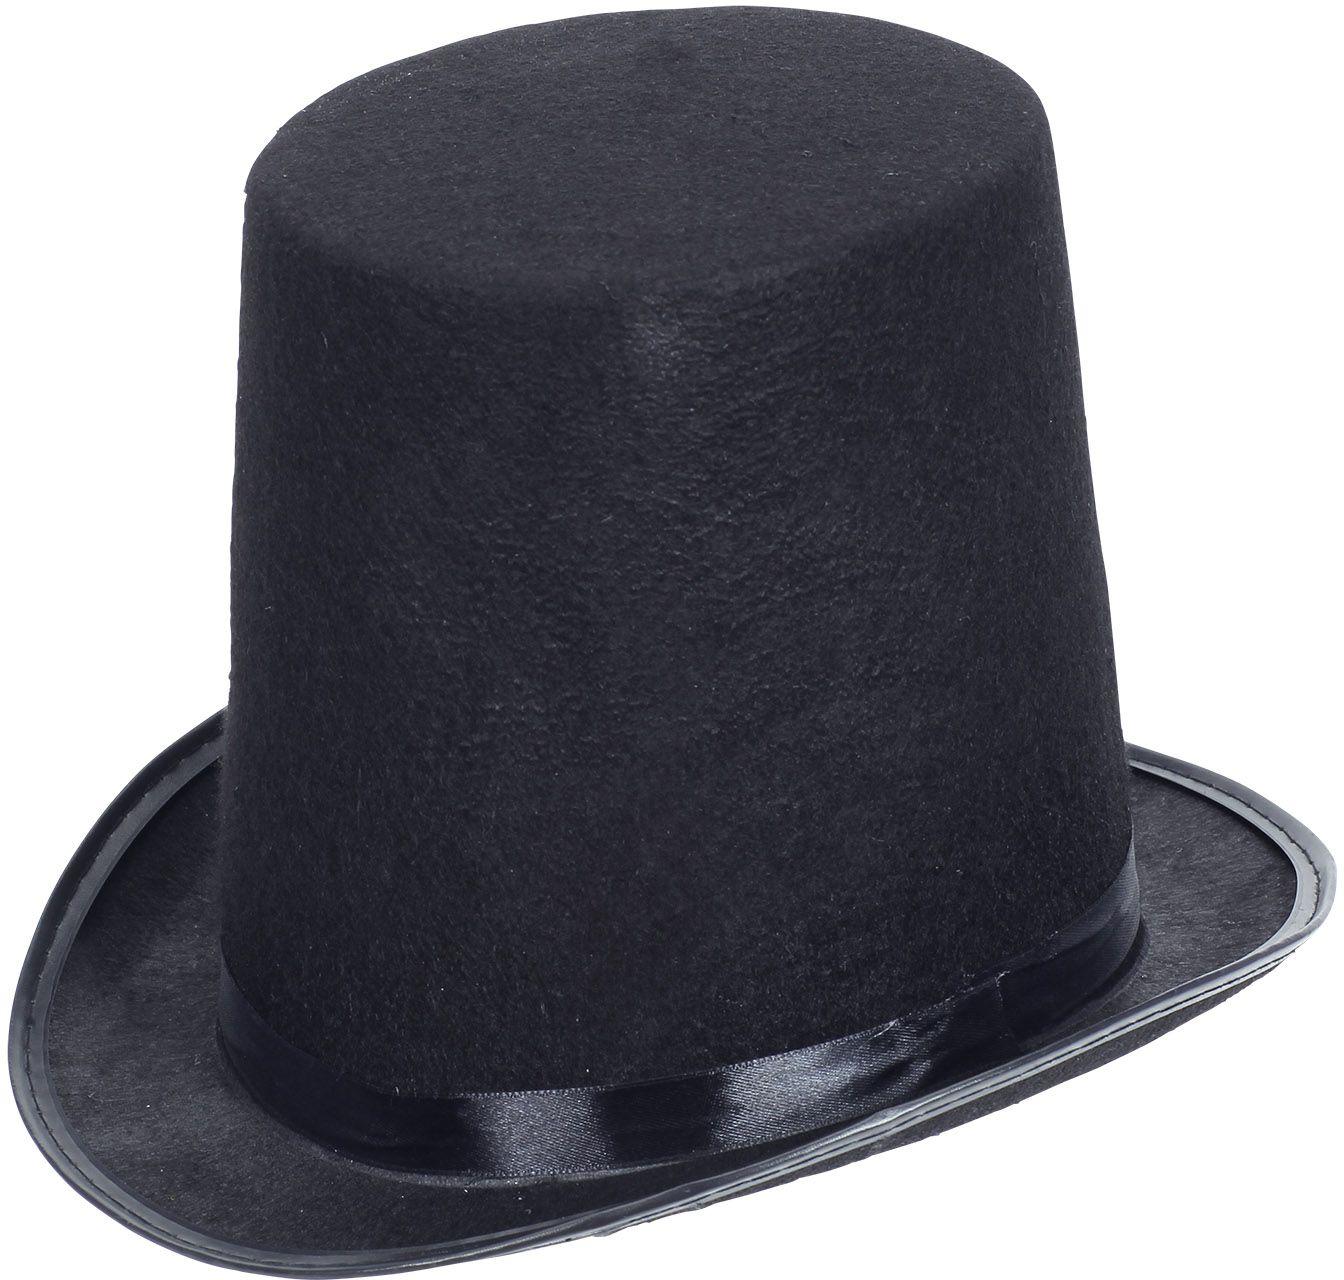 Zwarte hoge showmen hoed